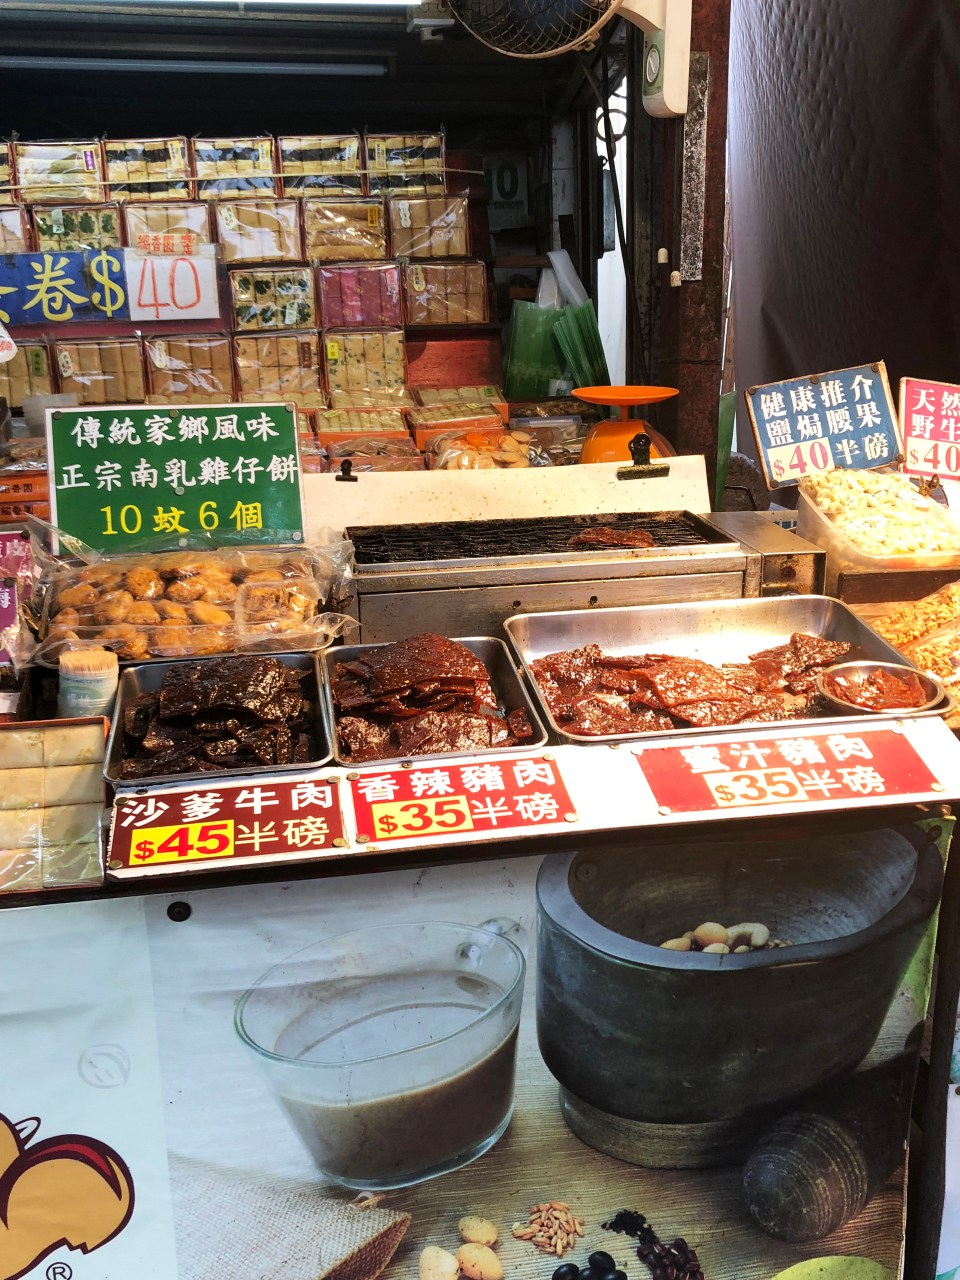 Lei Yue Mun - Pork Jerky